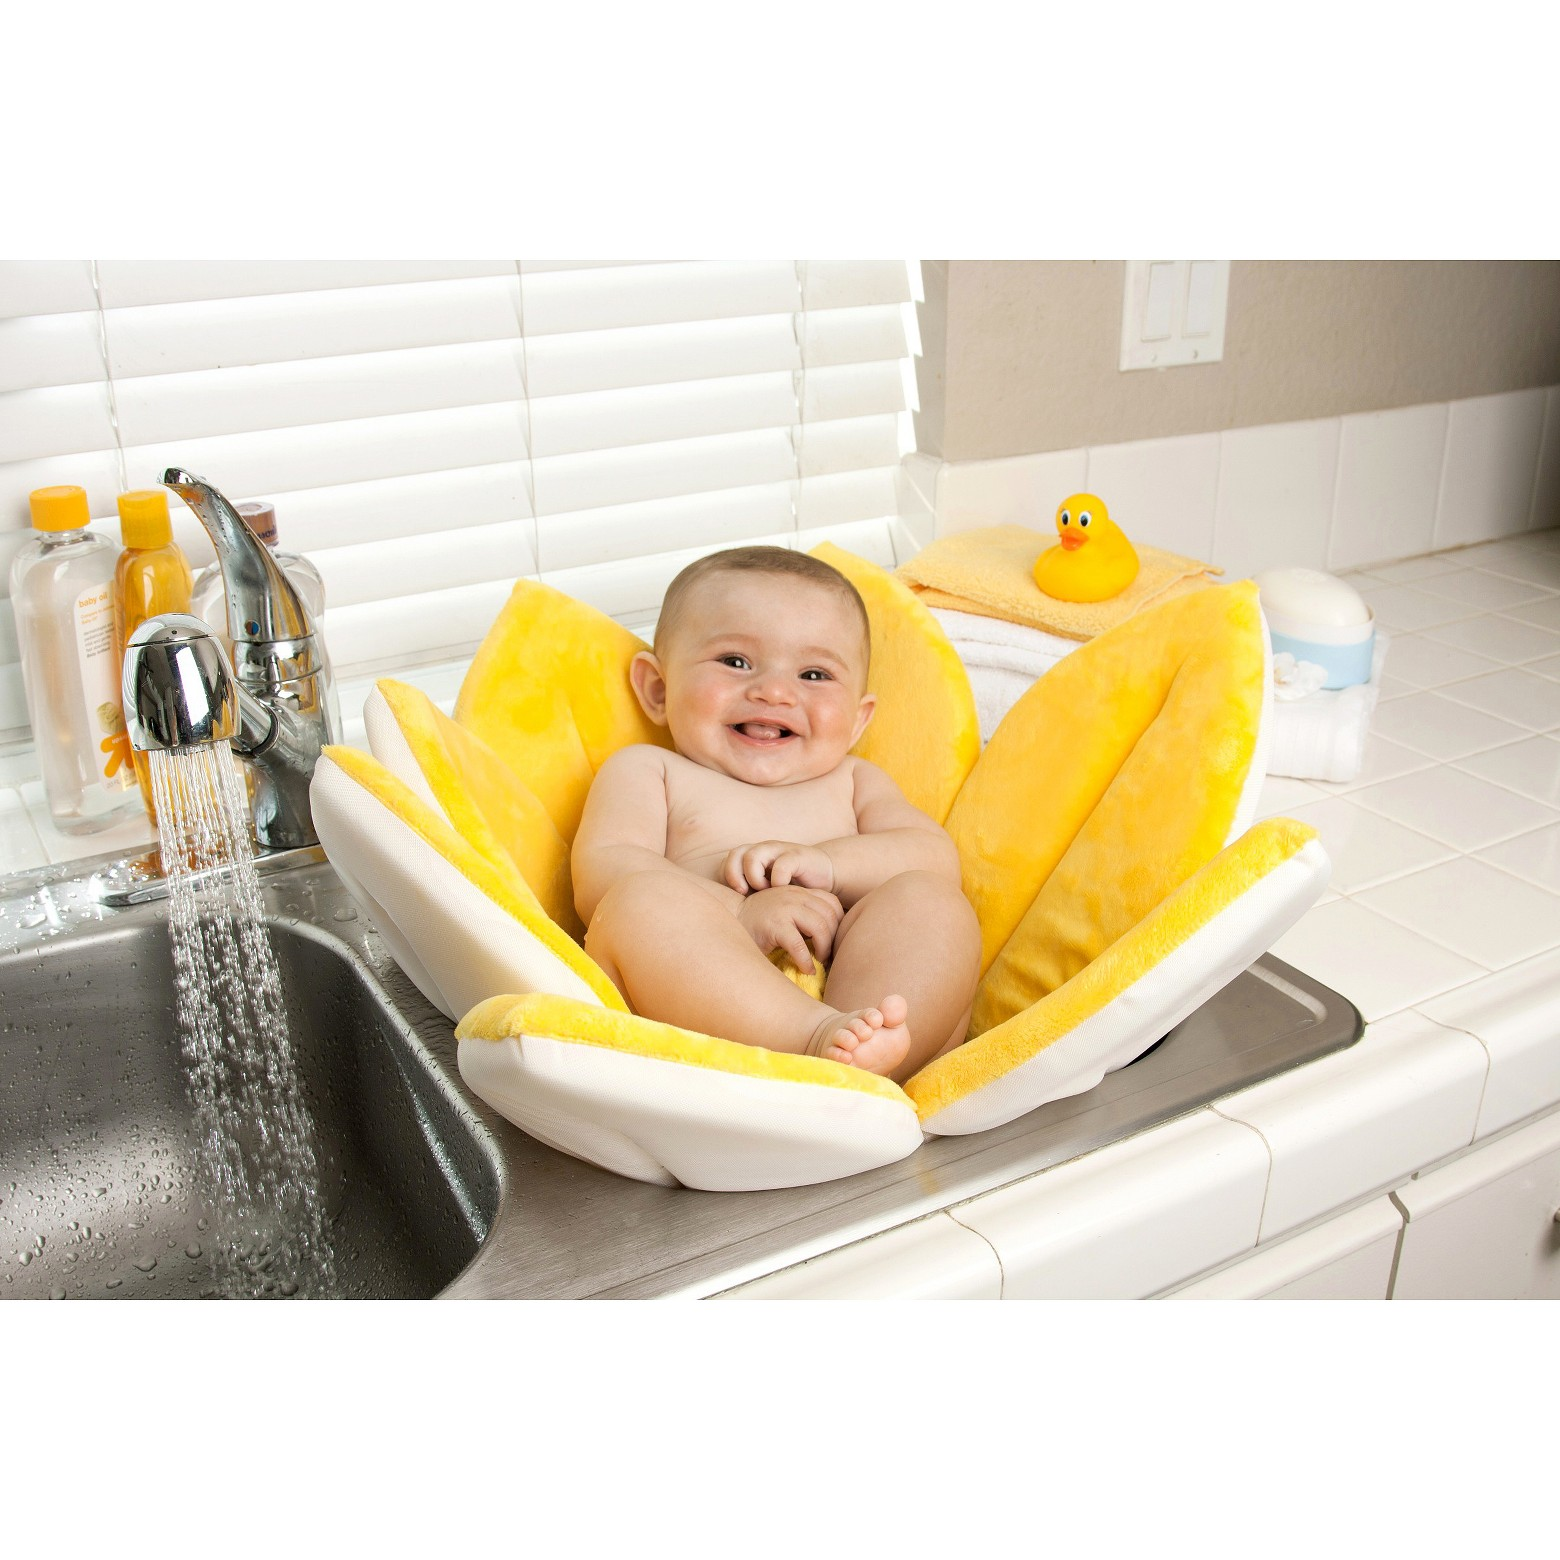 Blooming Bath Baby Bath : Target